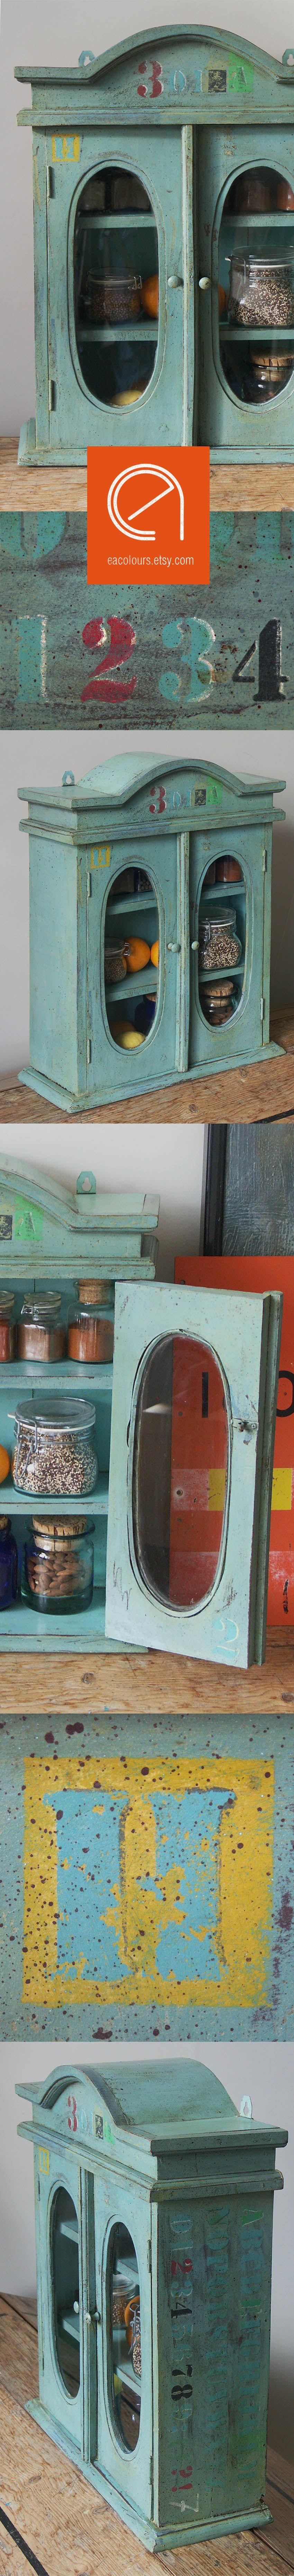 Vintage antique apothecary drug cabinet. Herb spices rack storage ...